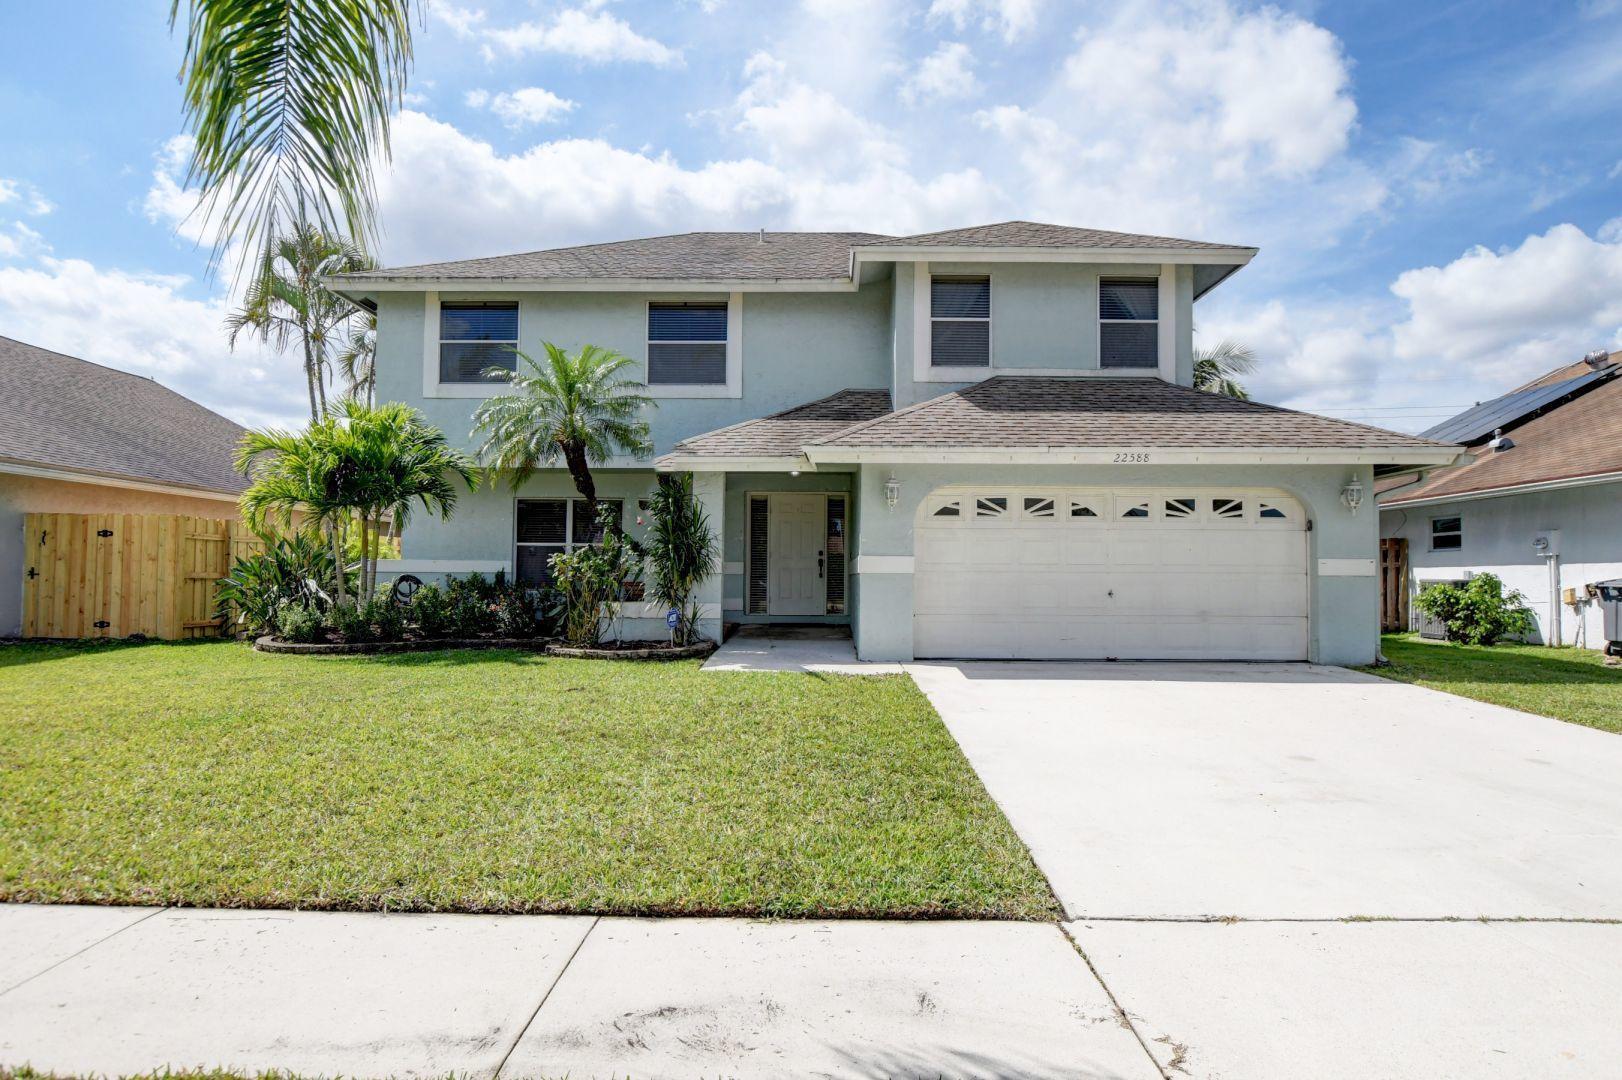 Home for sale in Boca Winds Boca Raton Florida